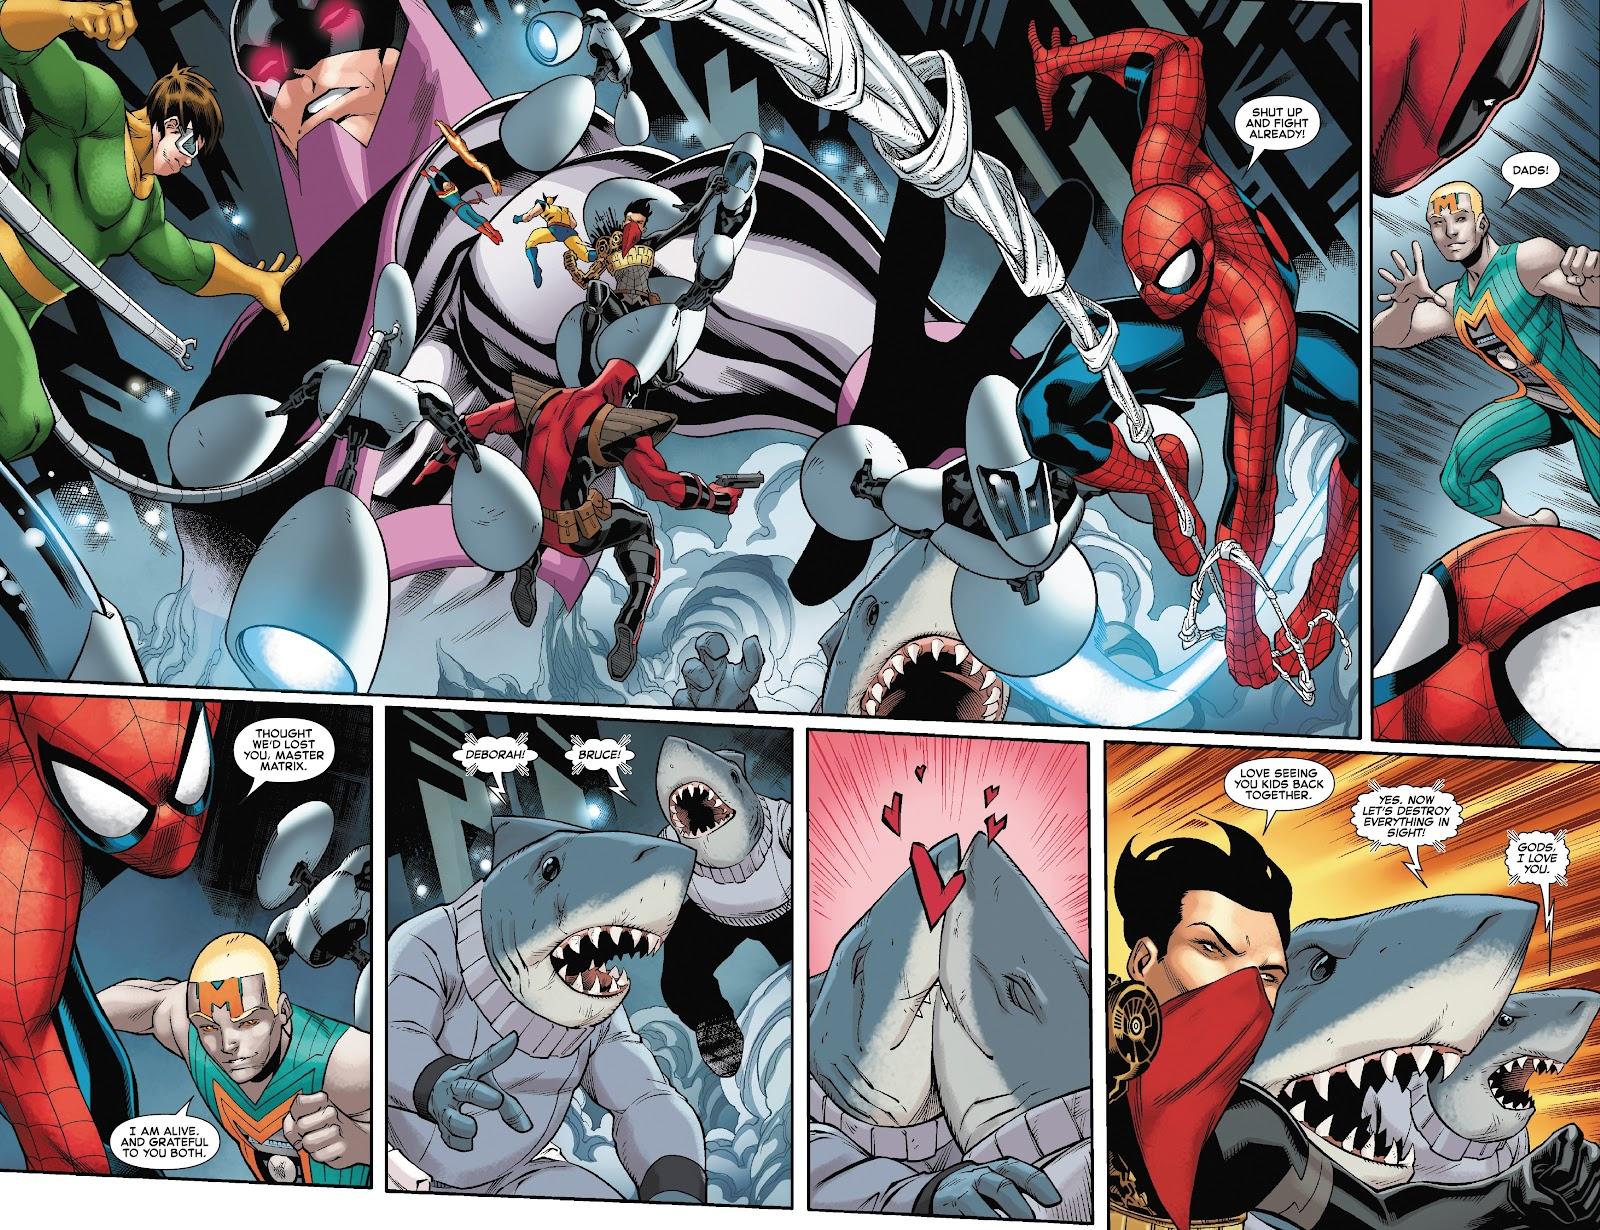 Read online Spider-Man/Deadpool comic -  Issue #49 - 4